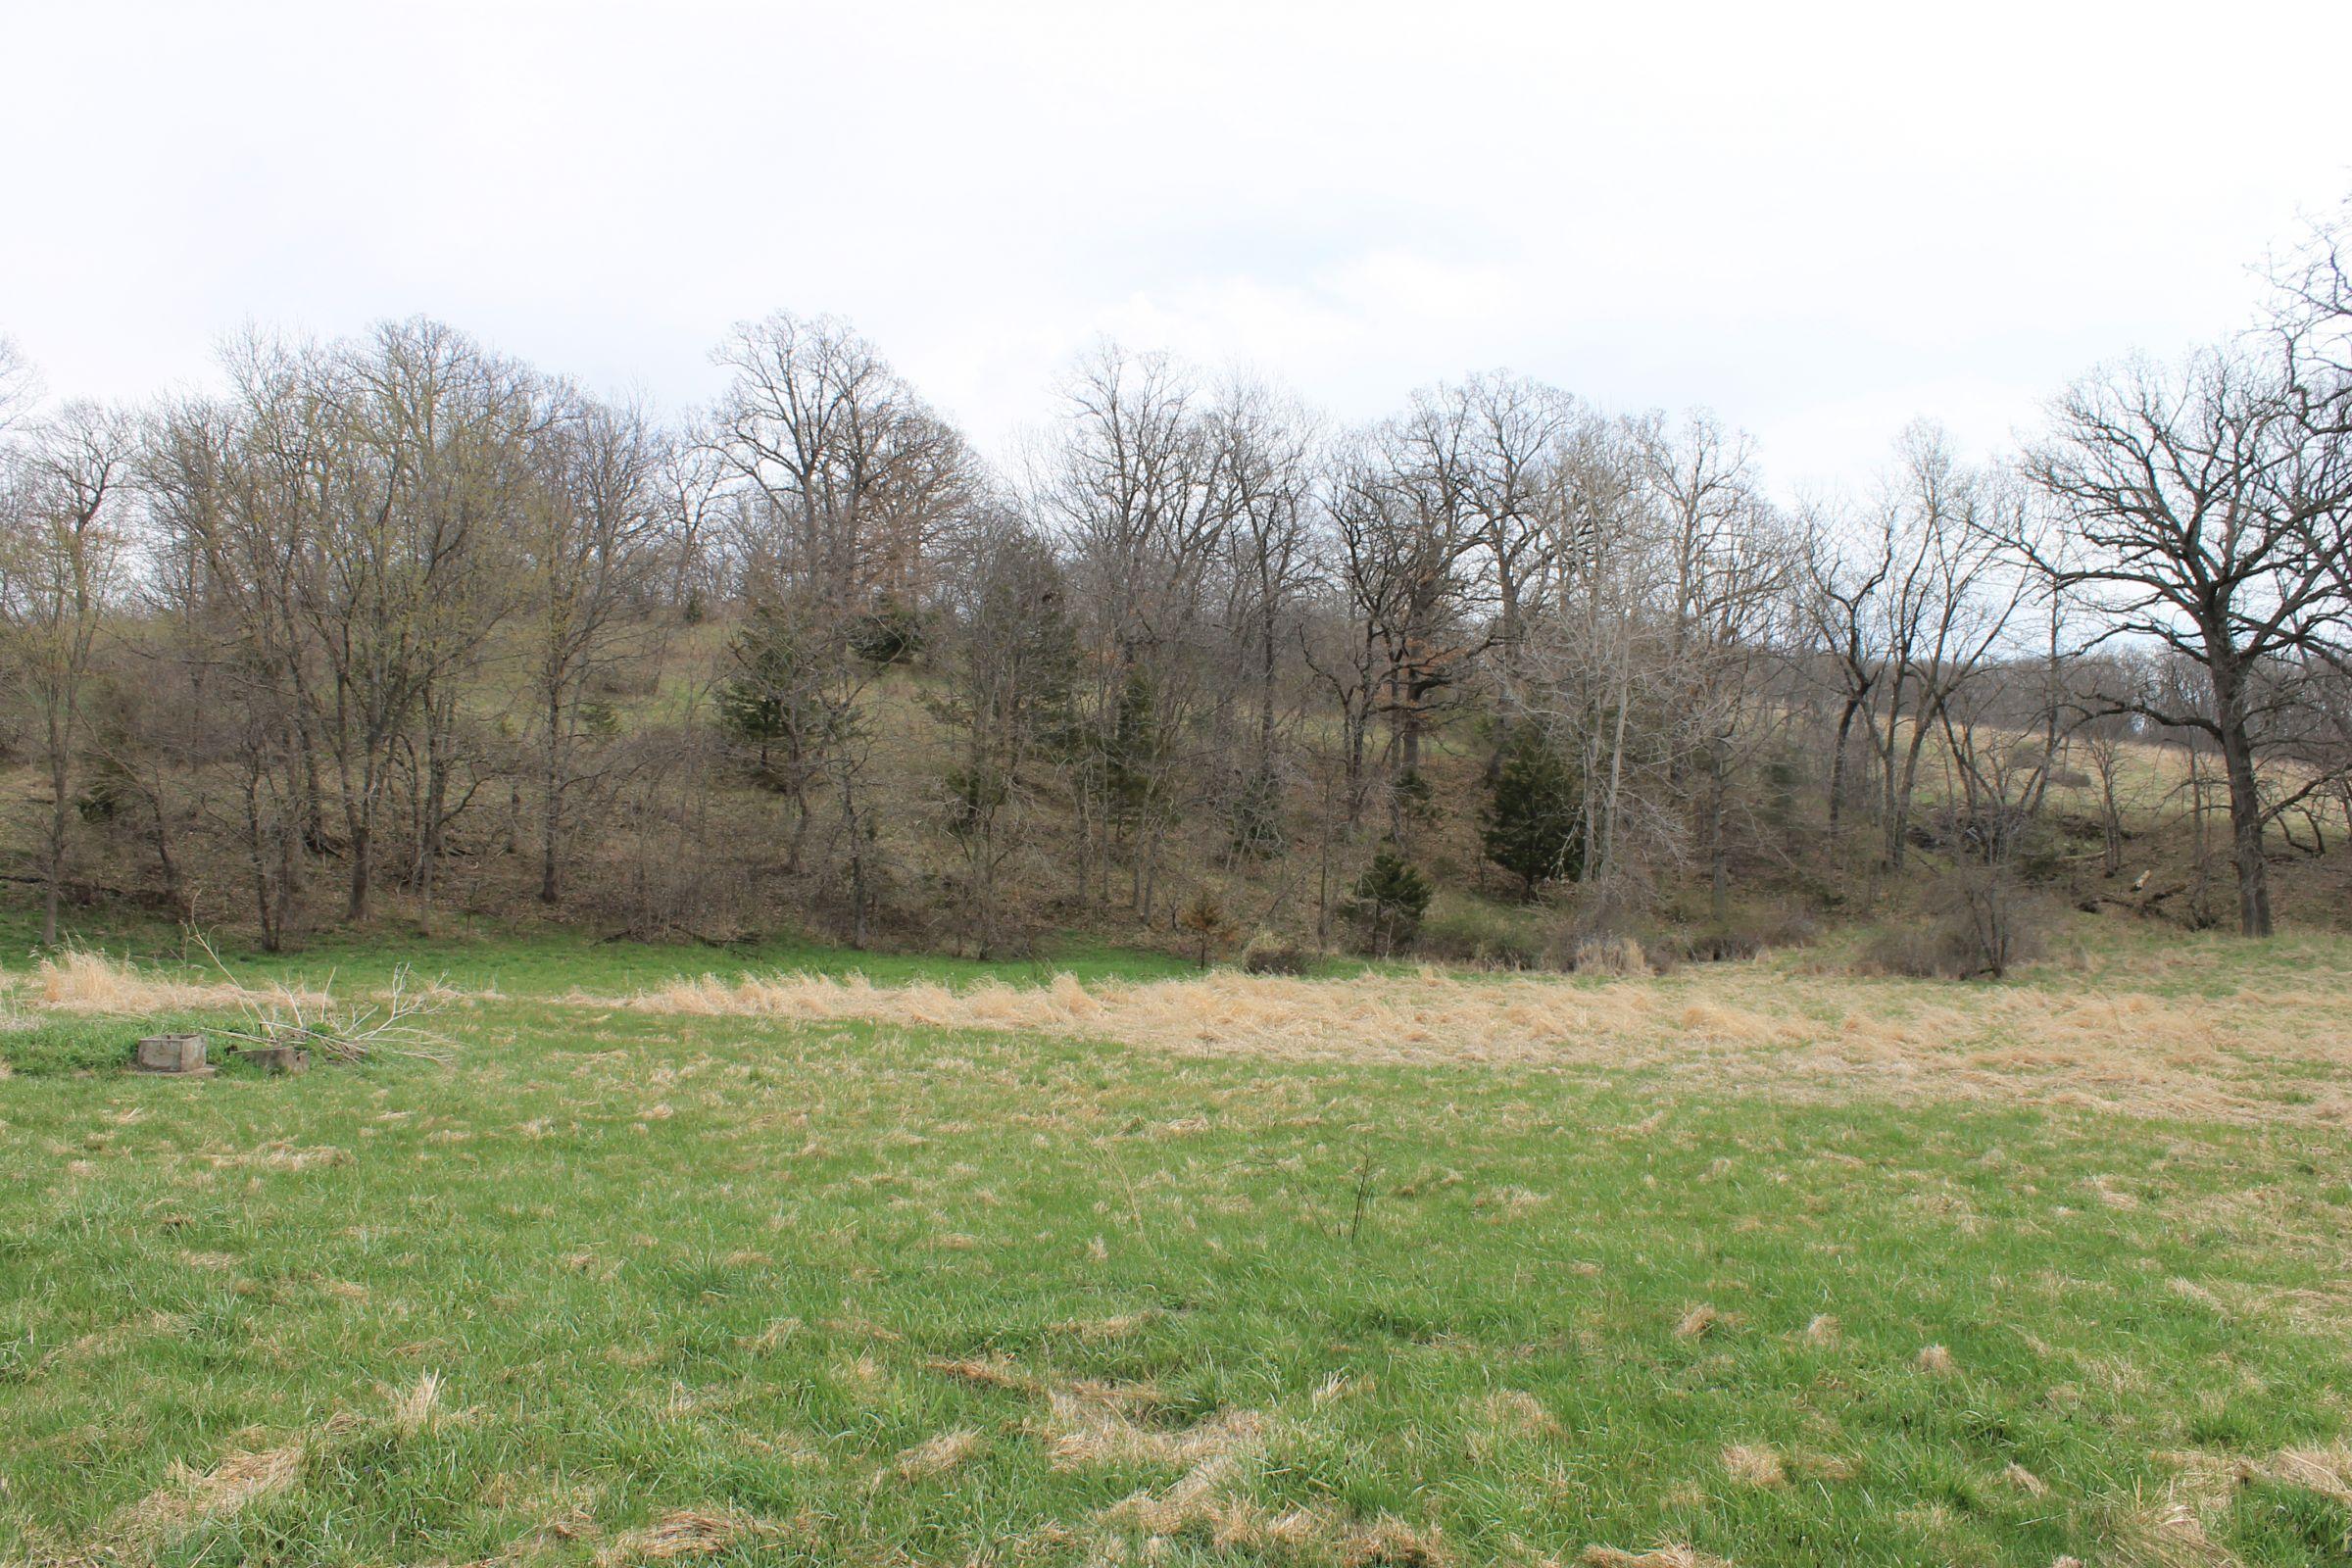 land-warren-county-iowa-71-acres-listing-number-15449-2-2021-04-09-150745.JPG